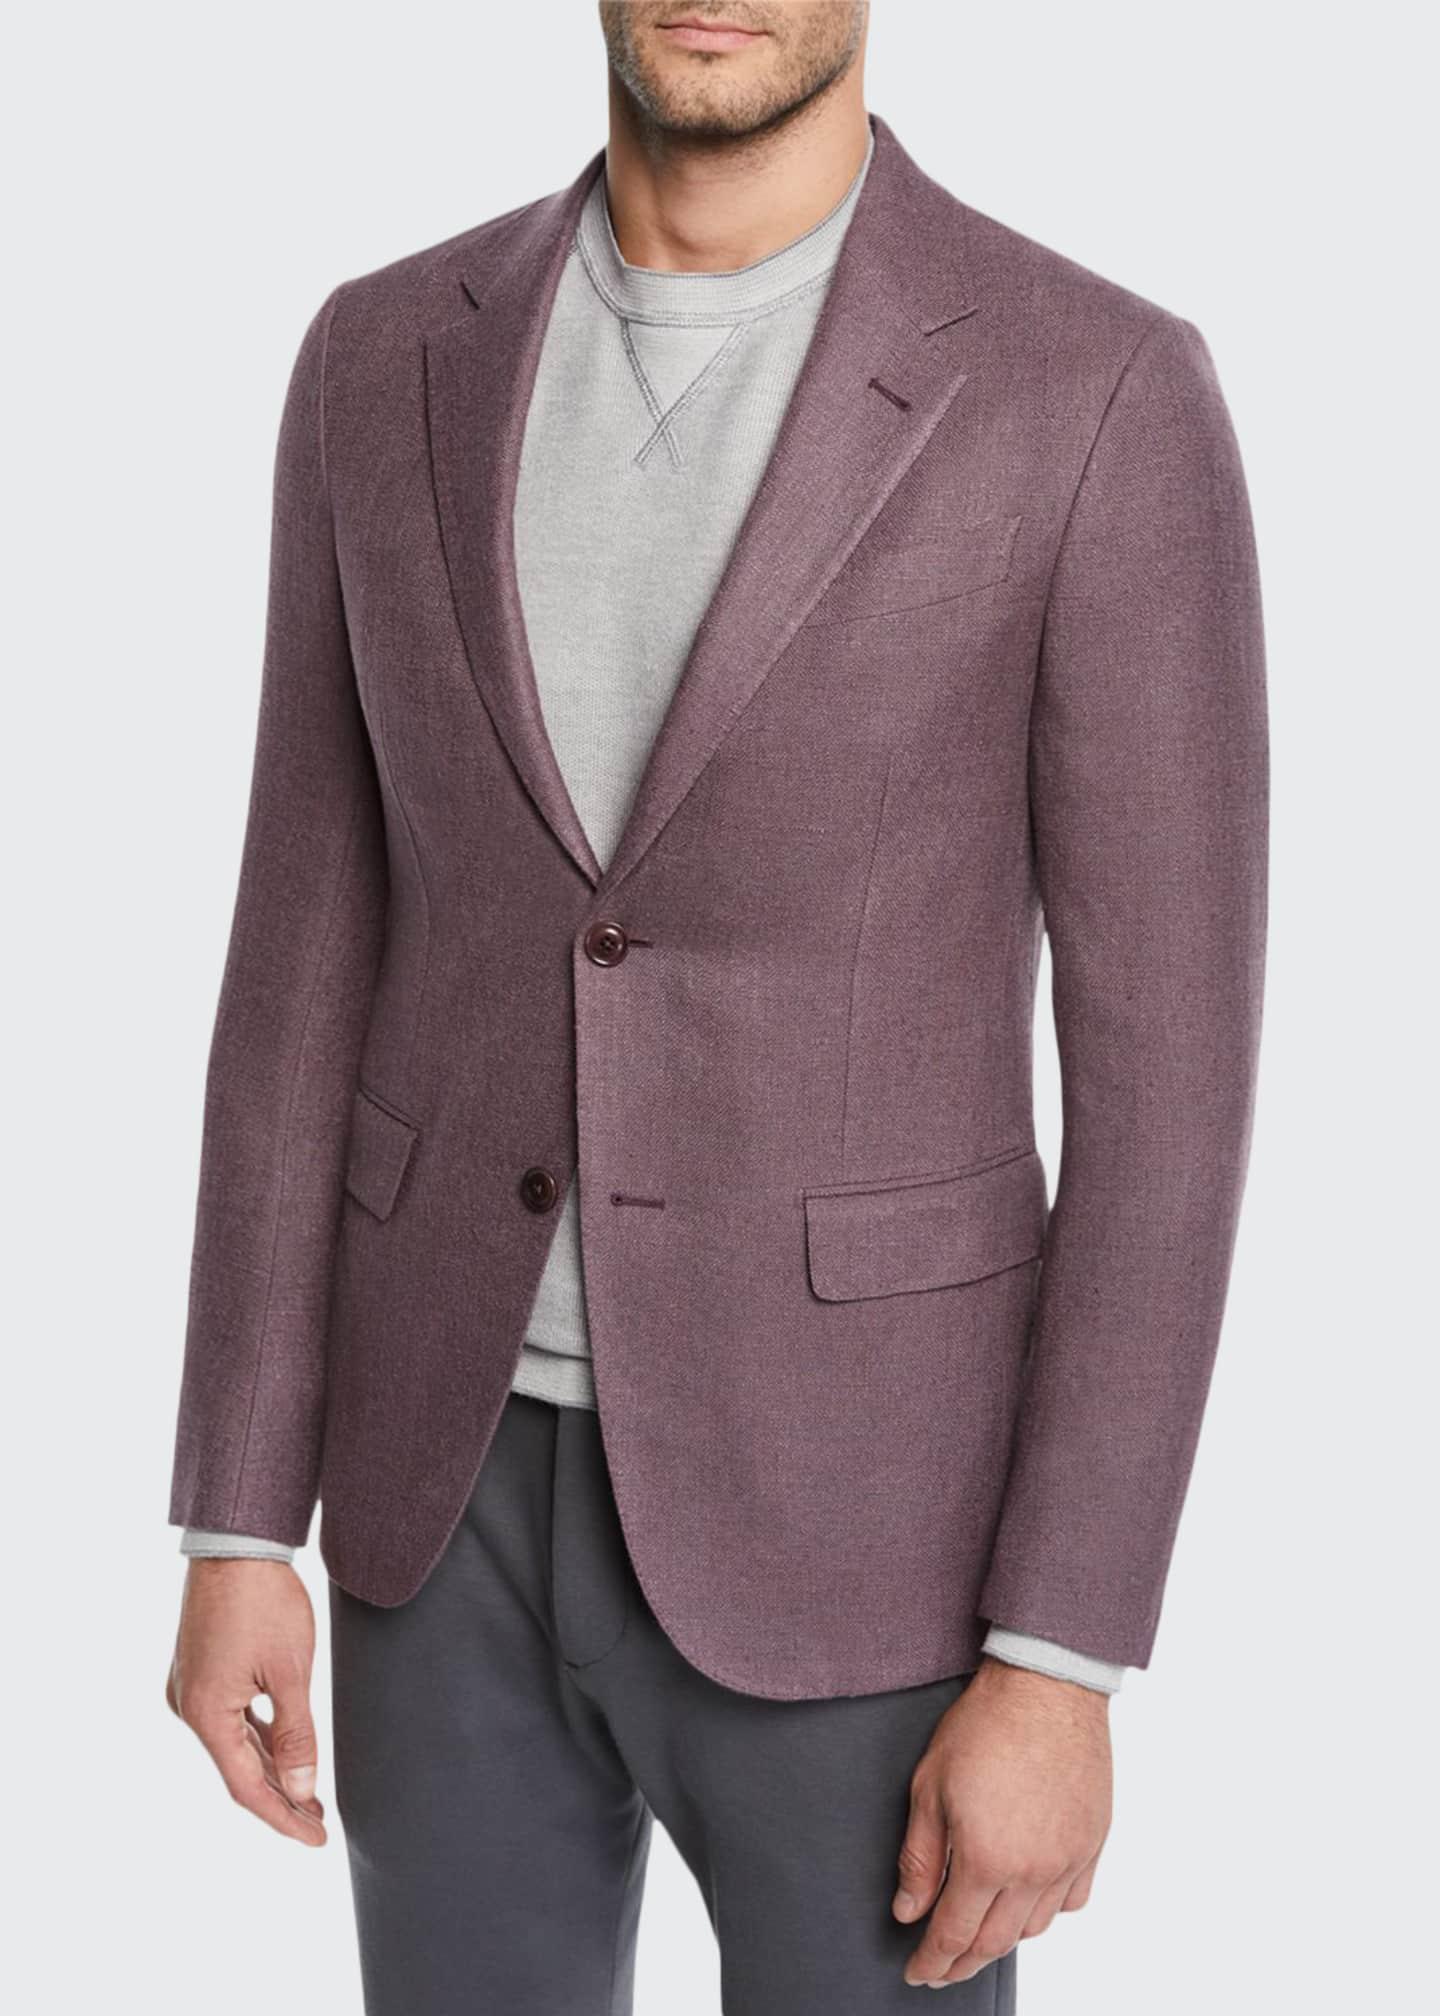 Ermenegildo Zegna Men's Button-Up Silk Blazer